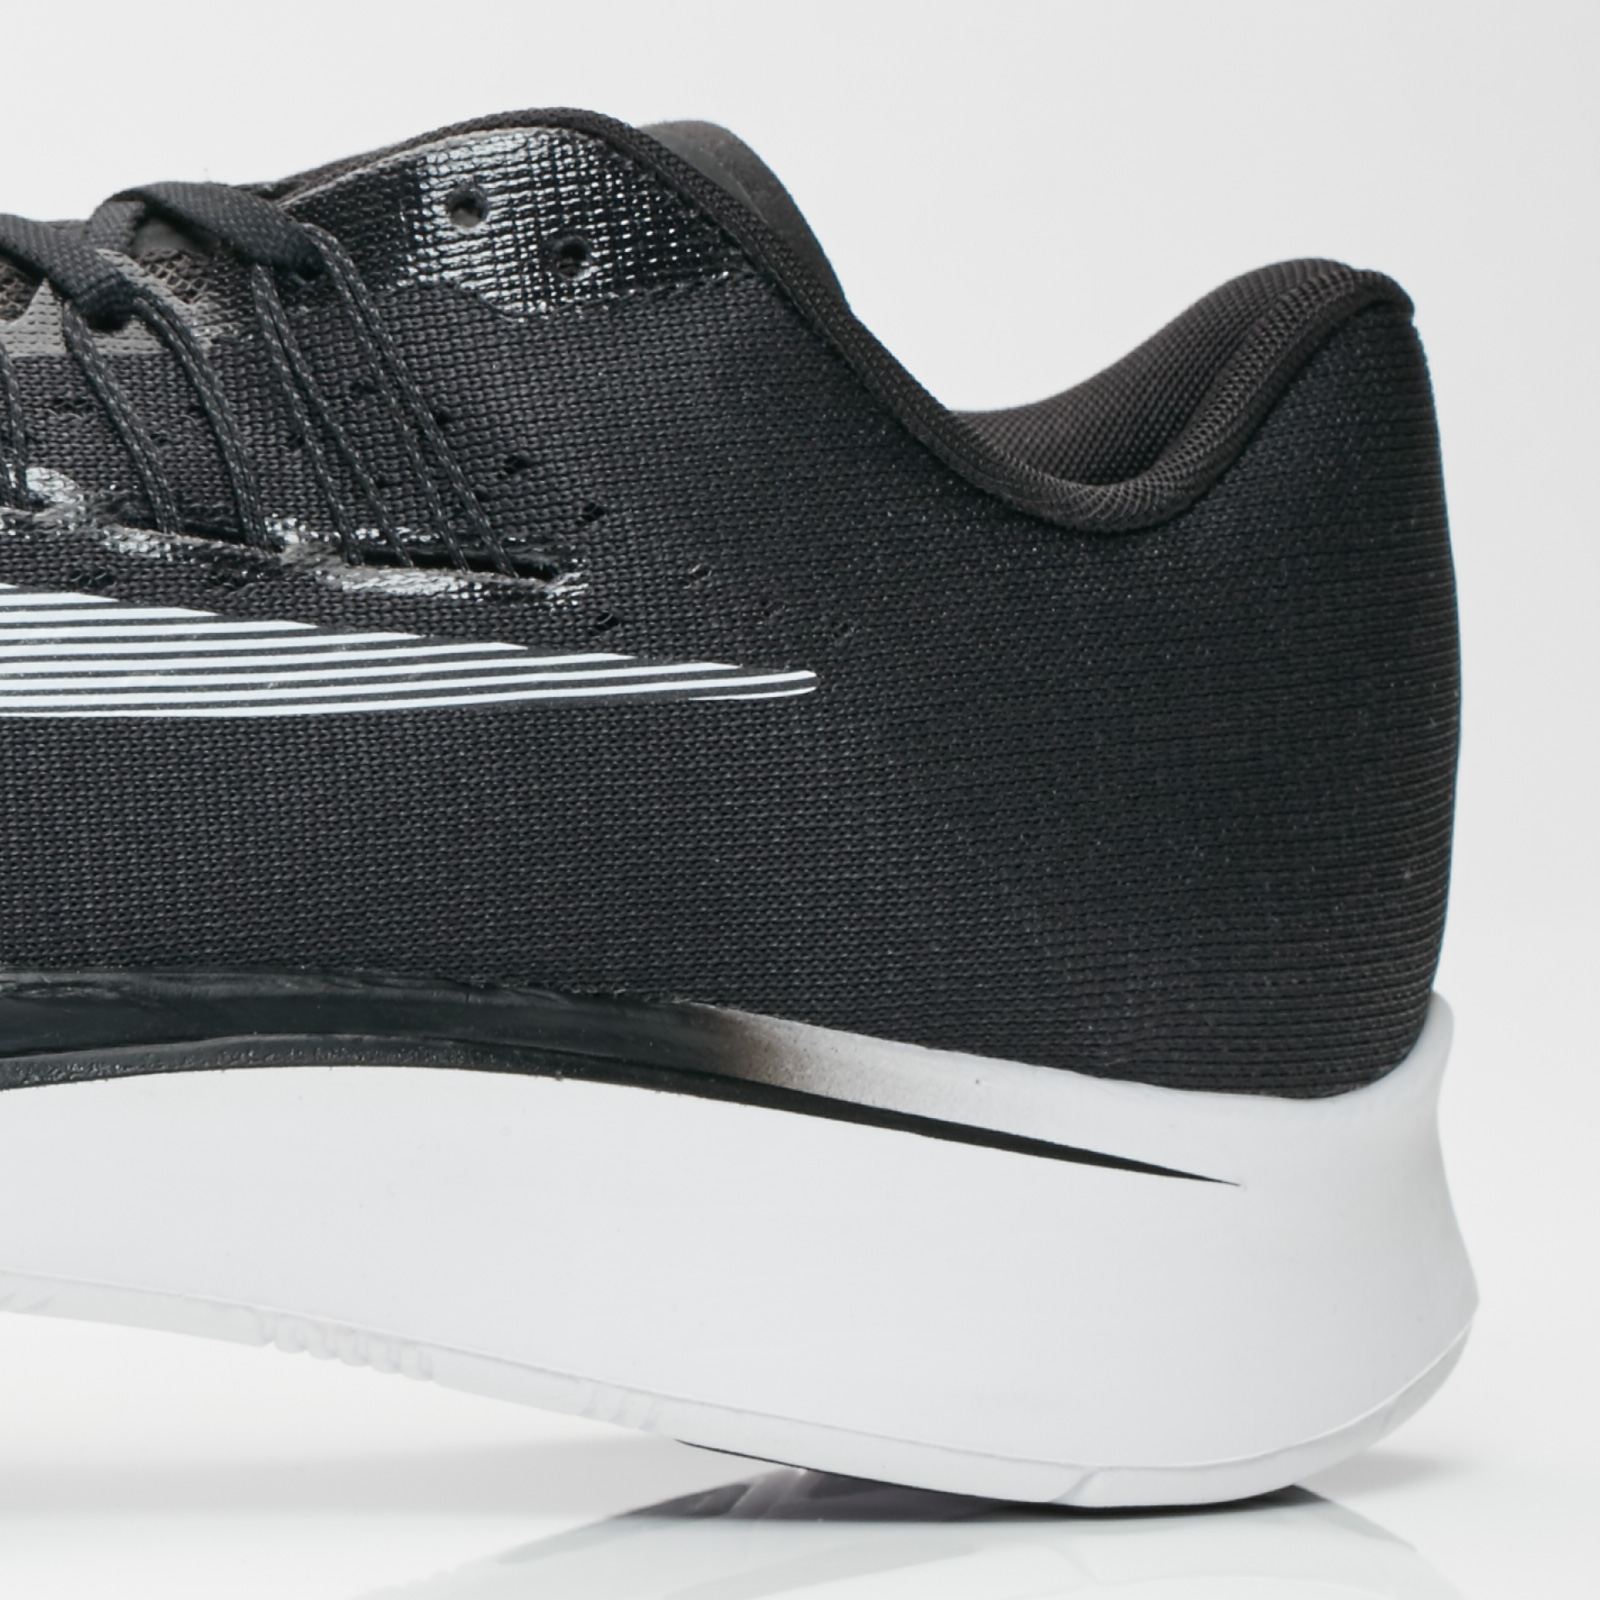 022d4a4c9d62 Nike Zoom Fly - 880848-001 - Sneakersnstuff